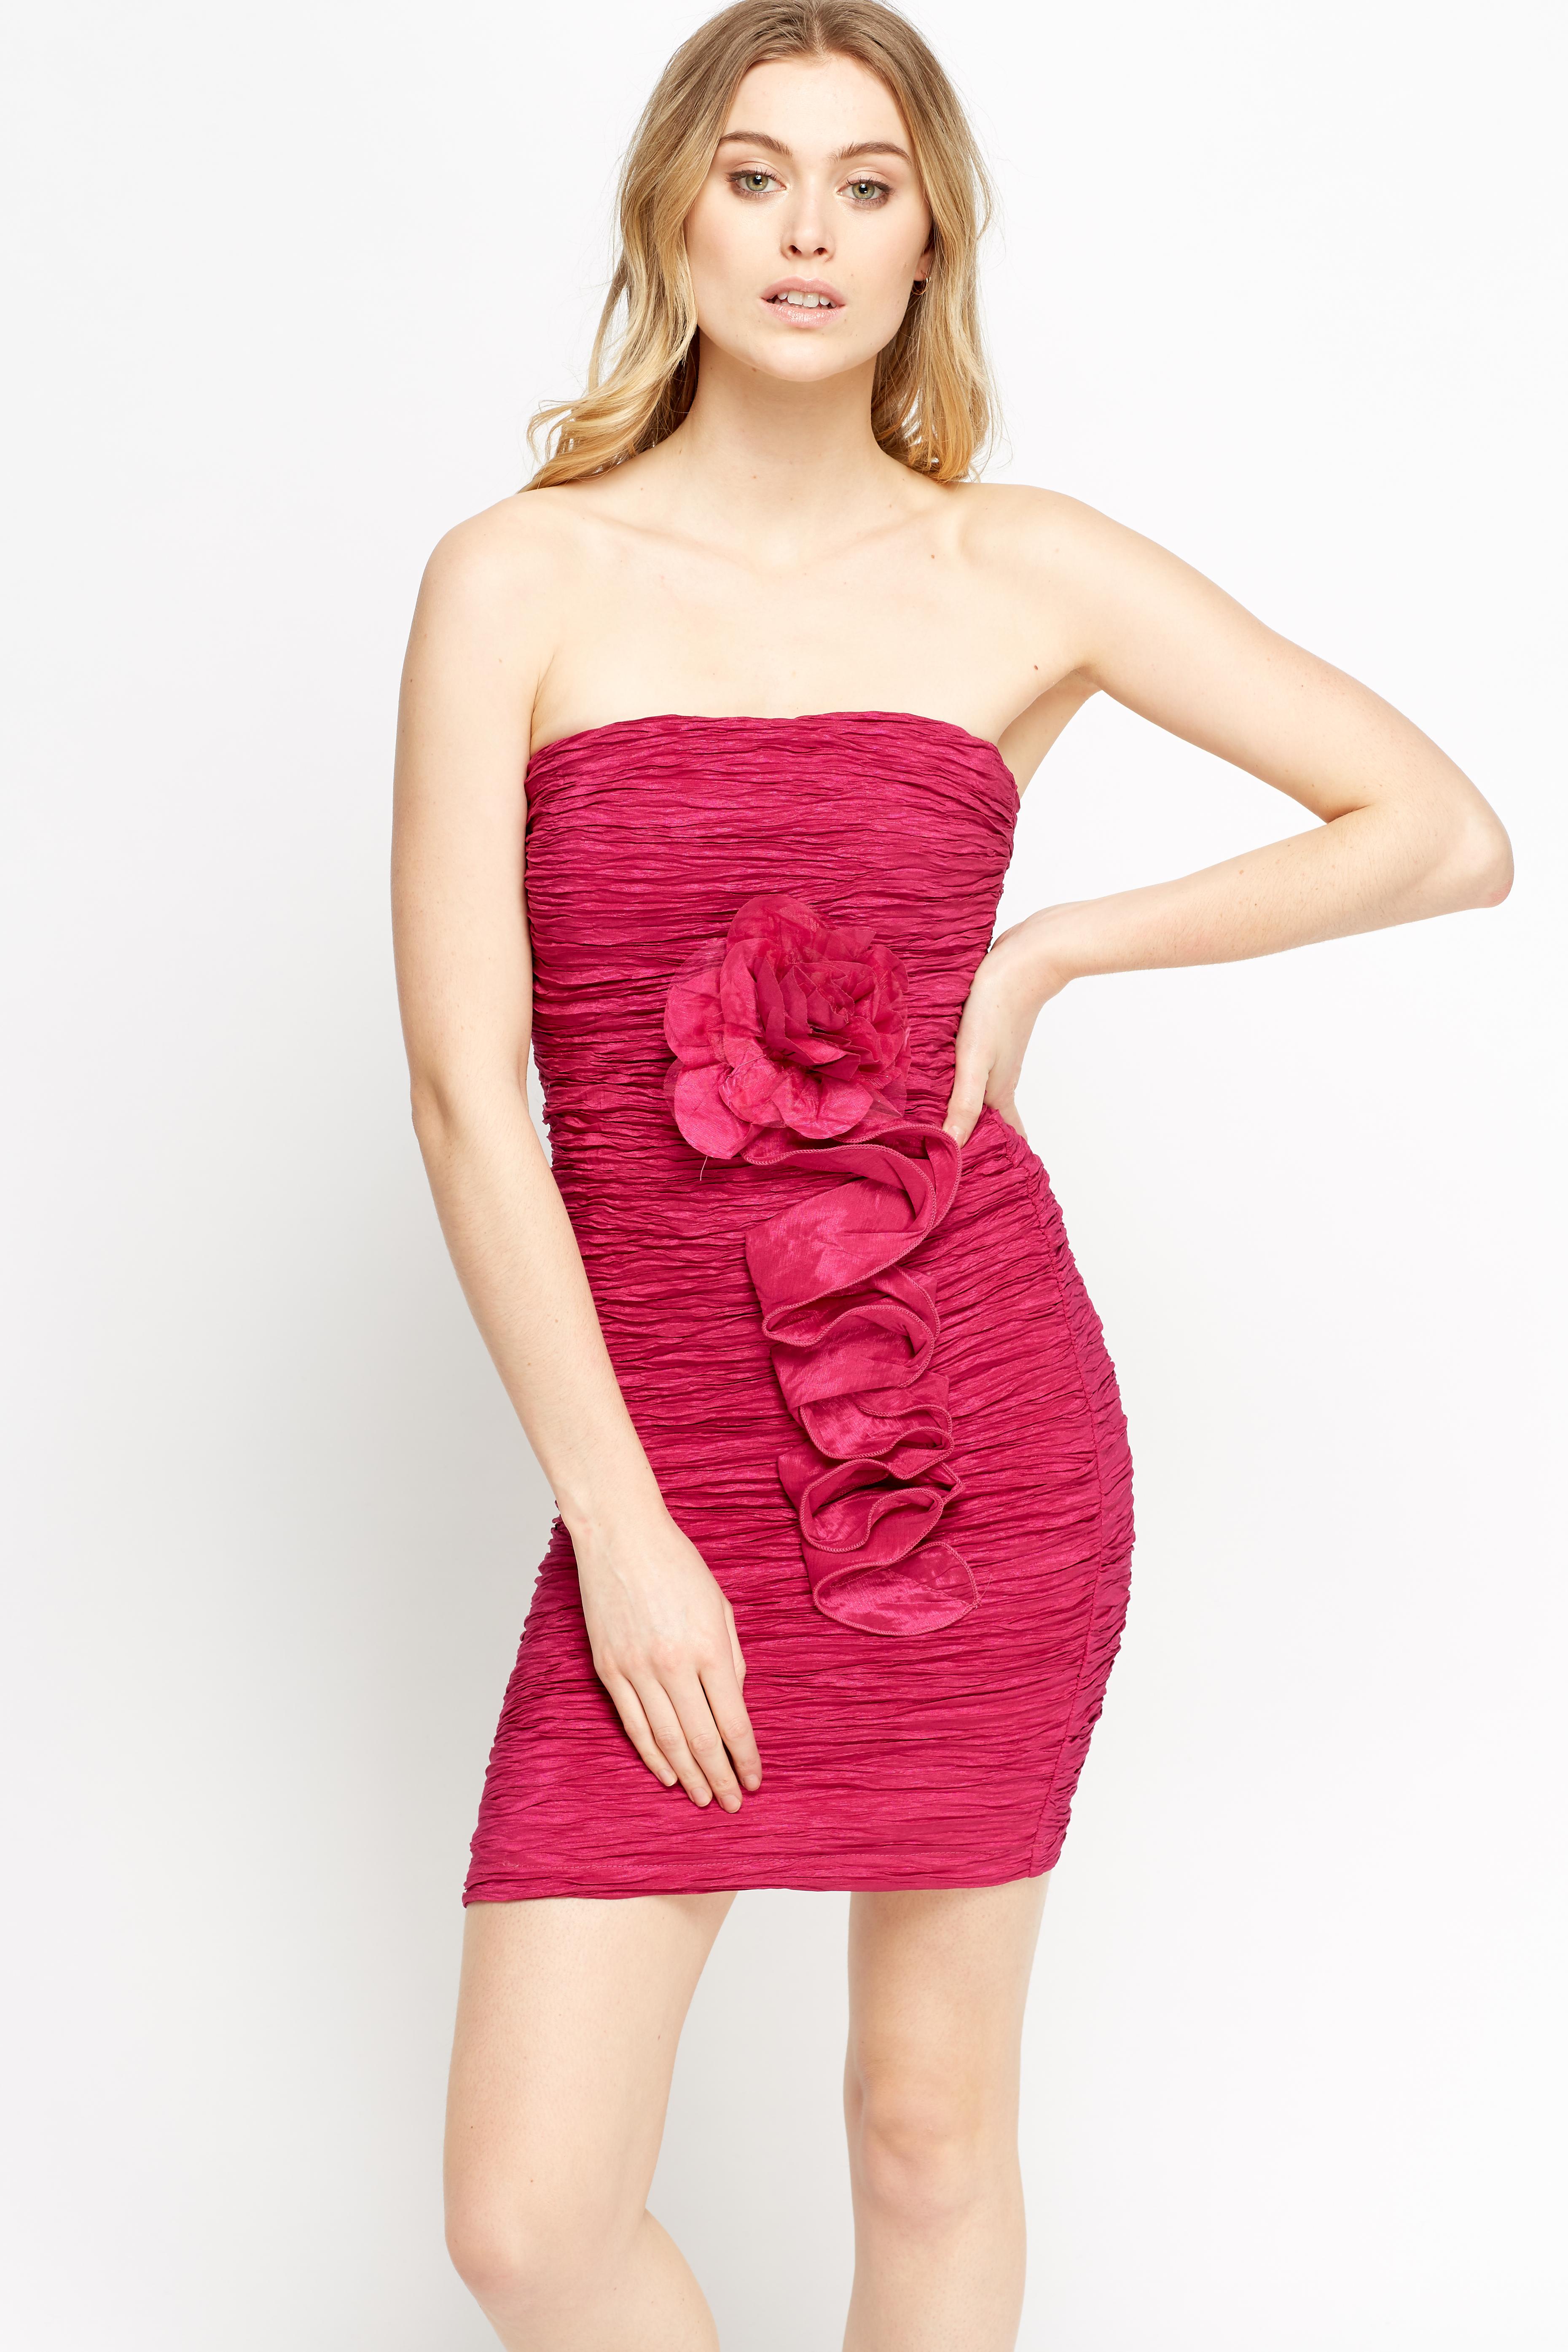 Bodycon under 5 where dresses buy